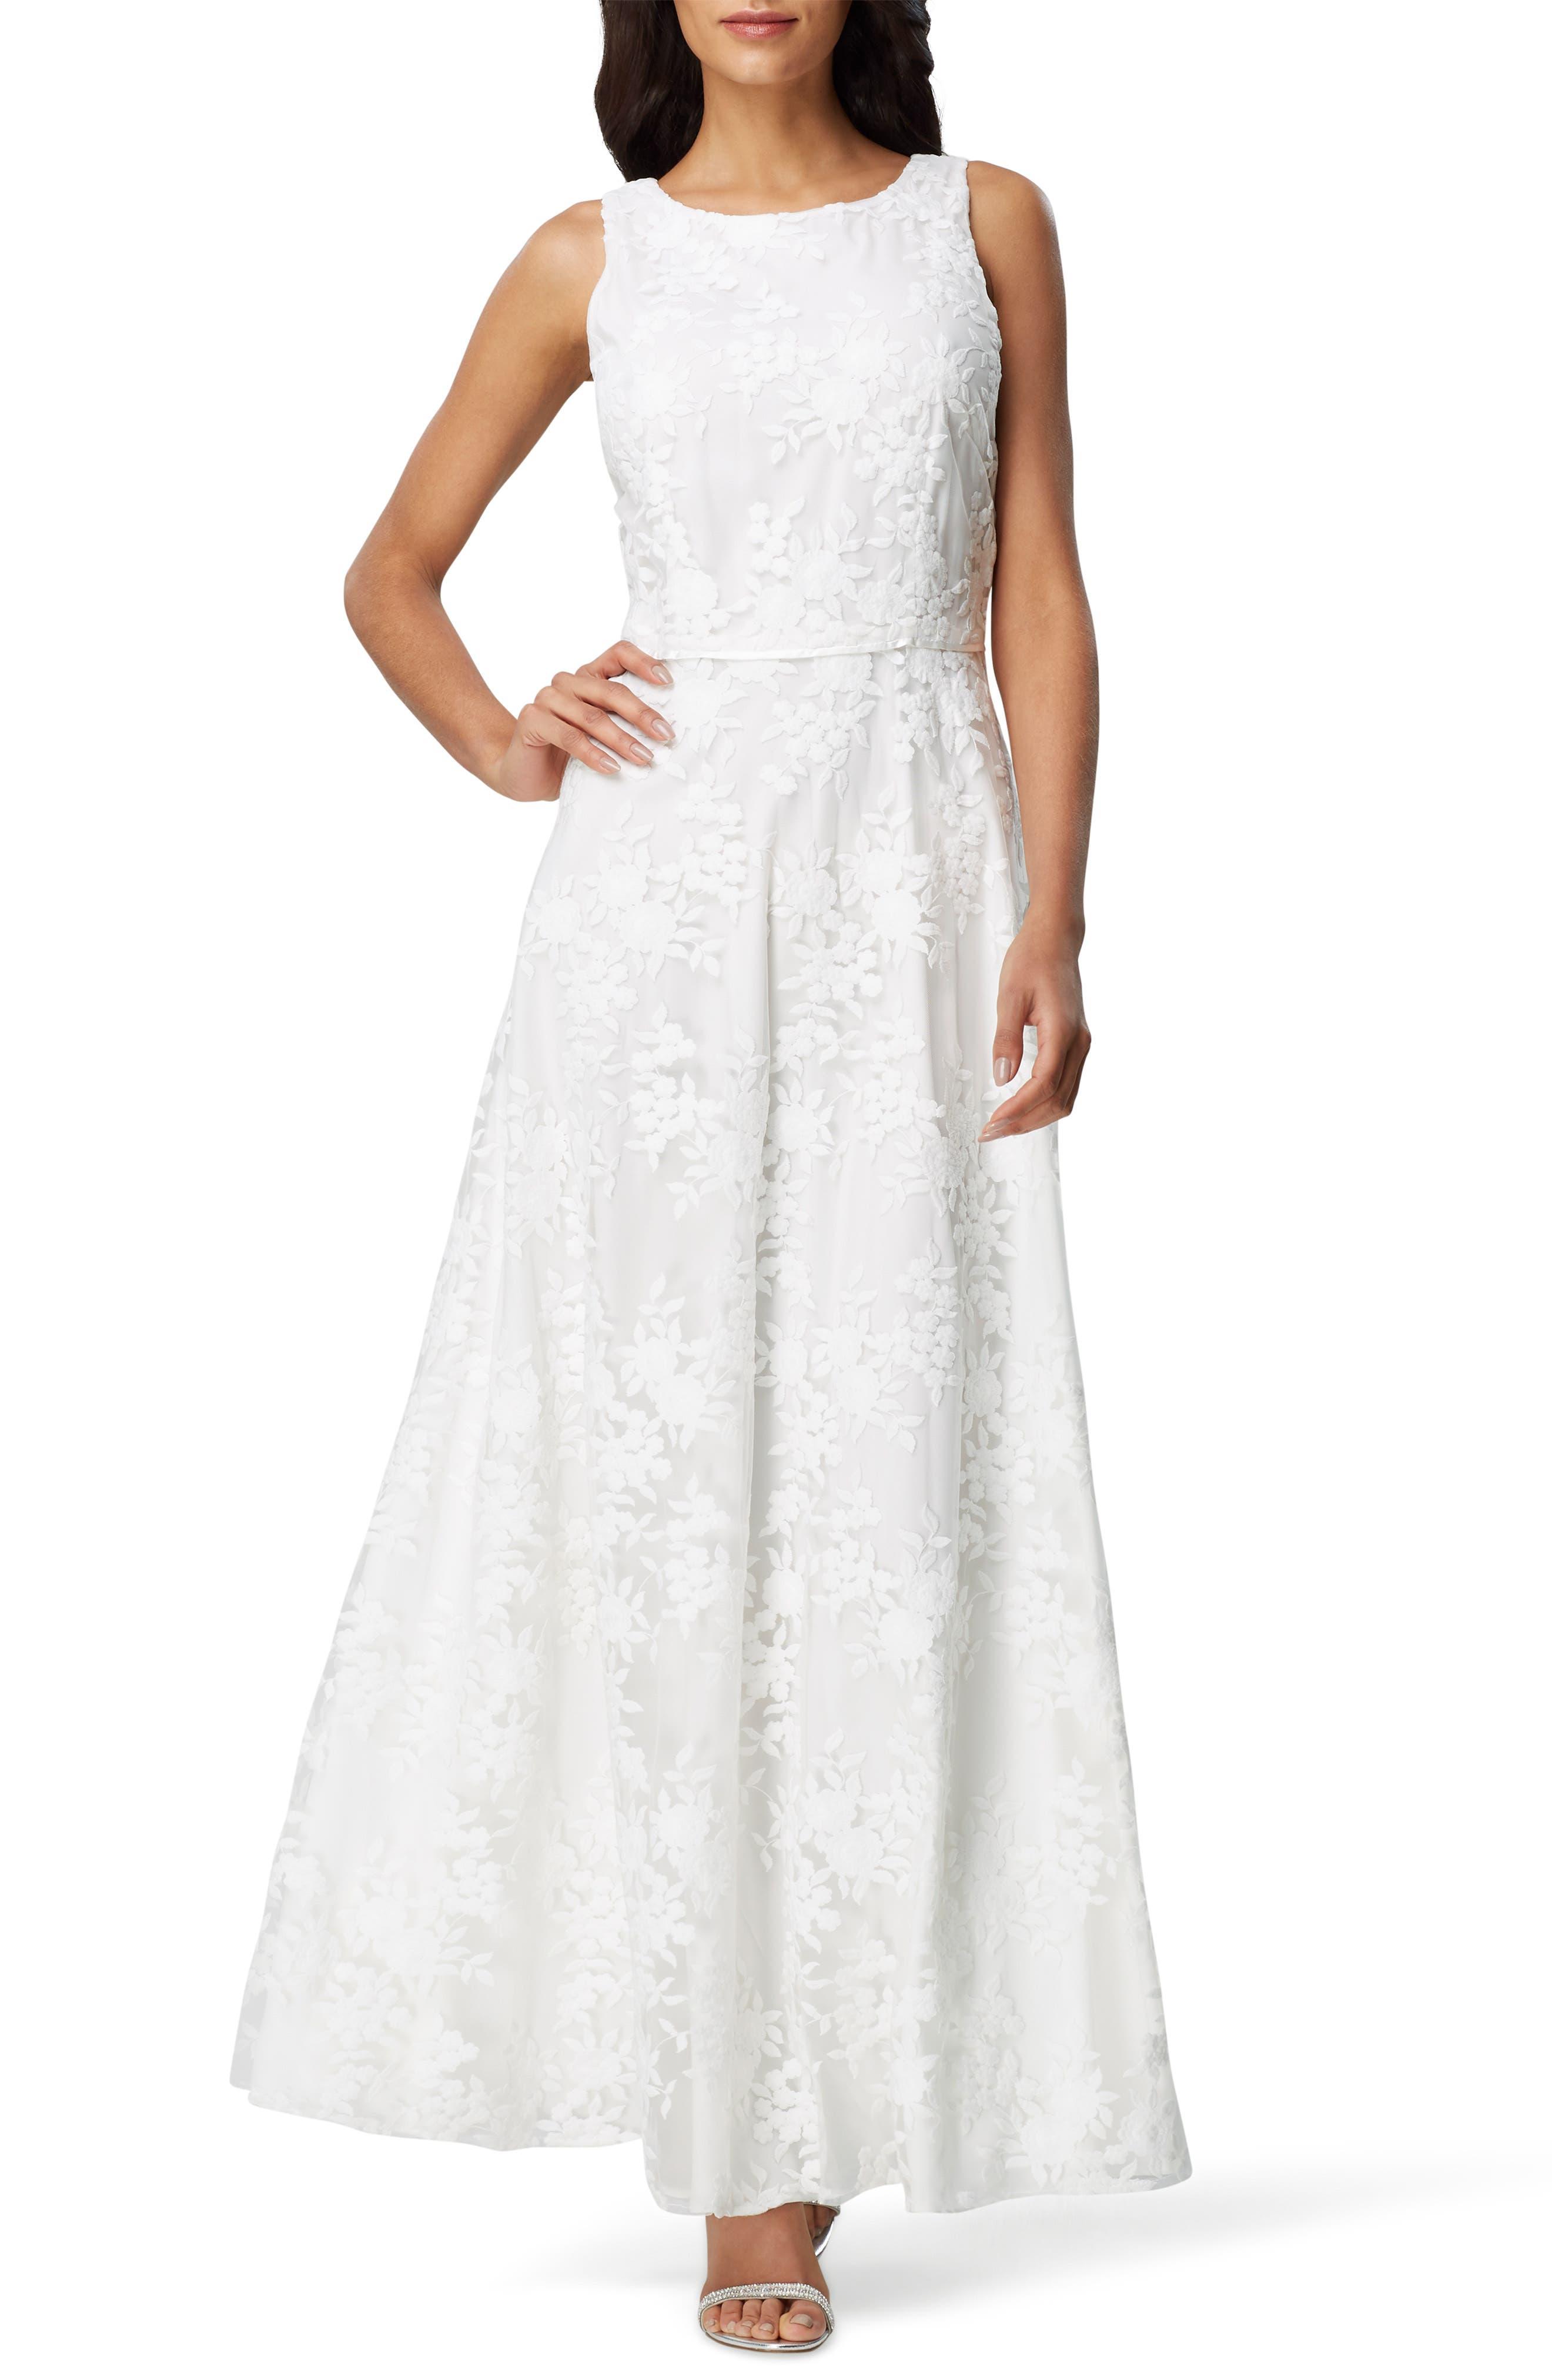 Tahari Sleeveless Embroidered Mesh Gown, Ivory